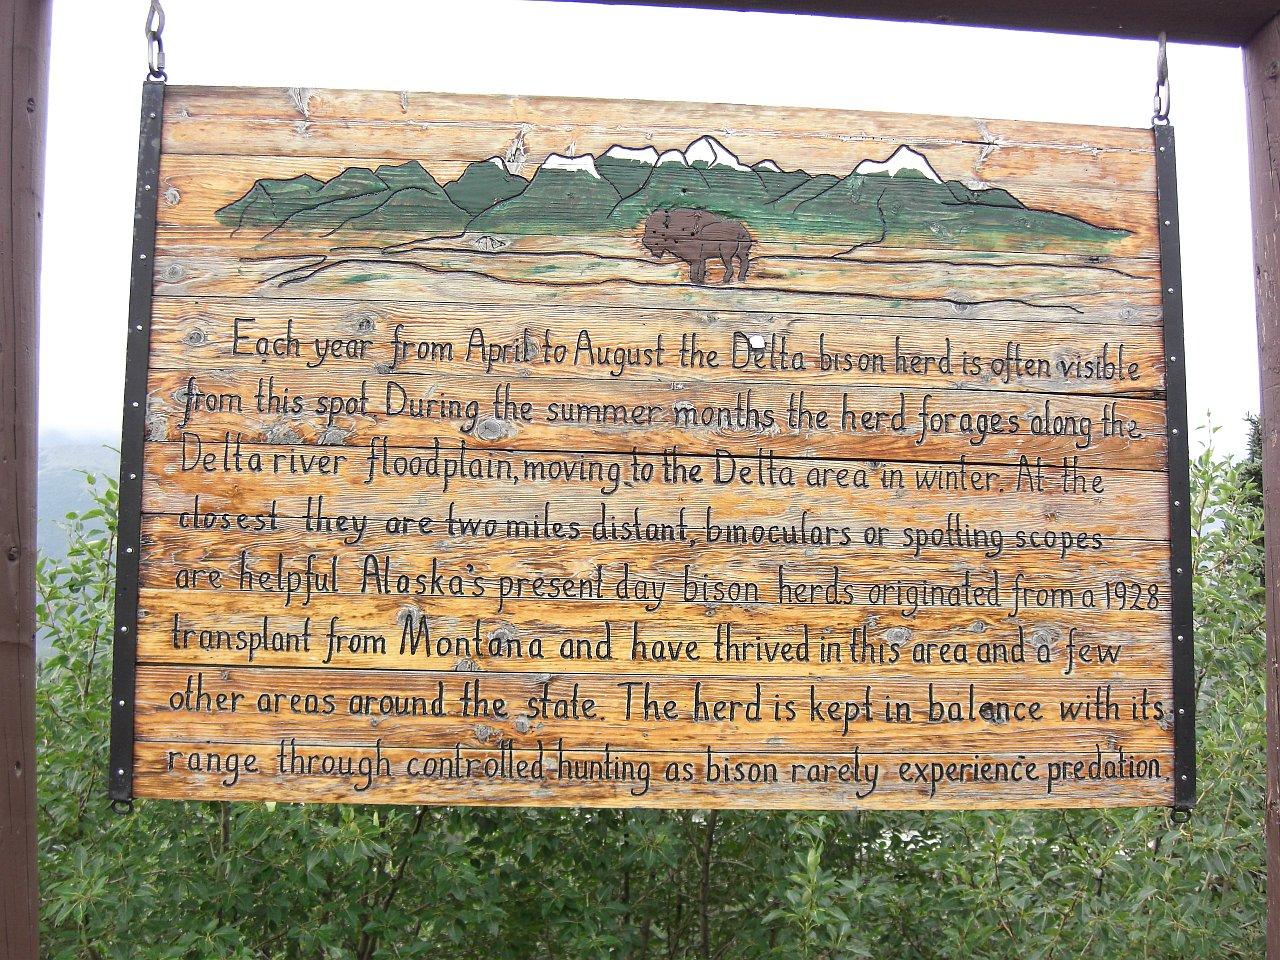 Alaska Denalinationalpark.